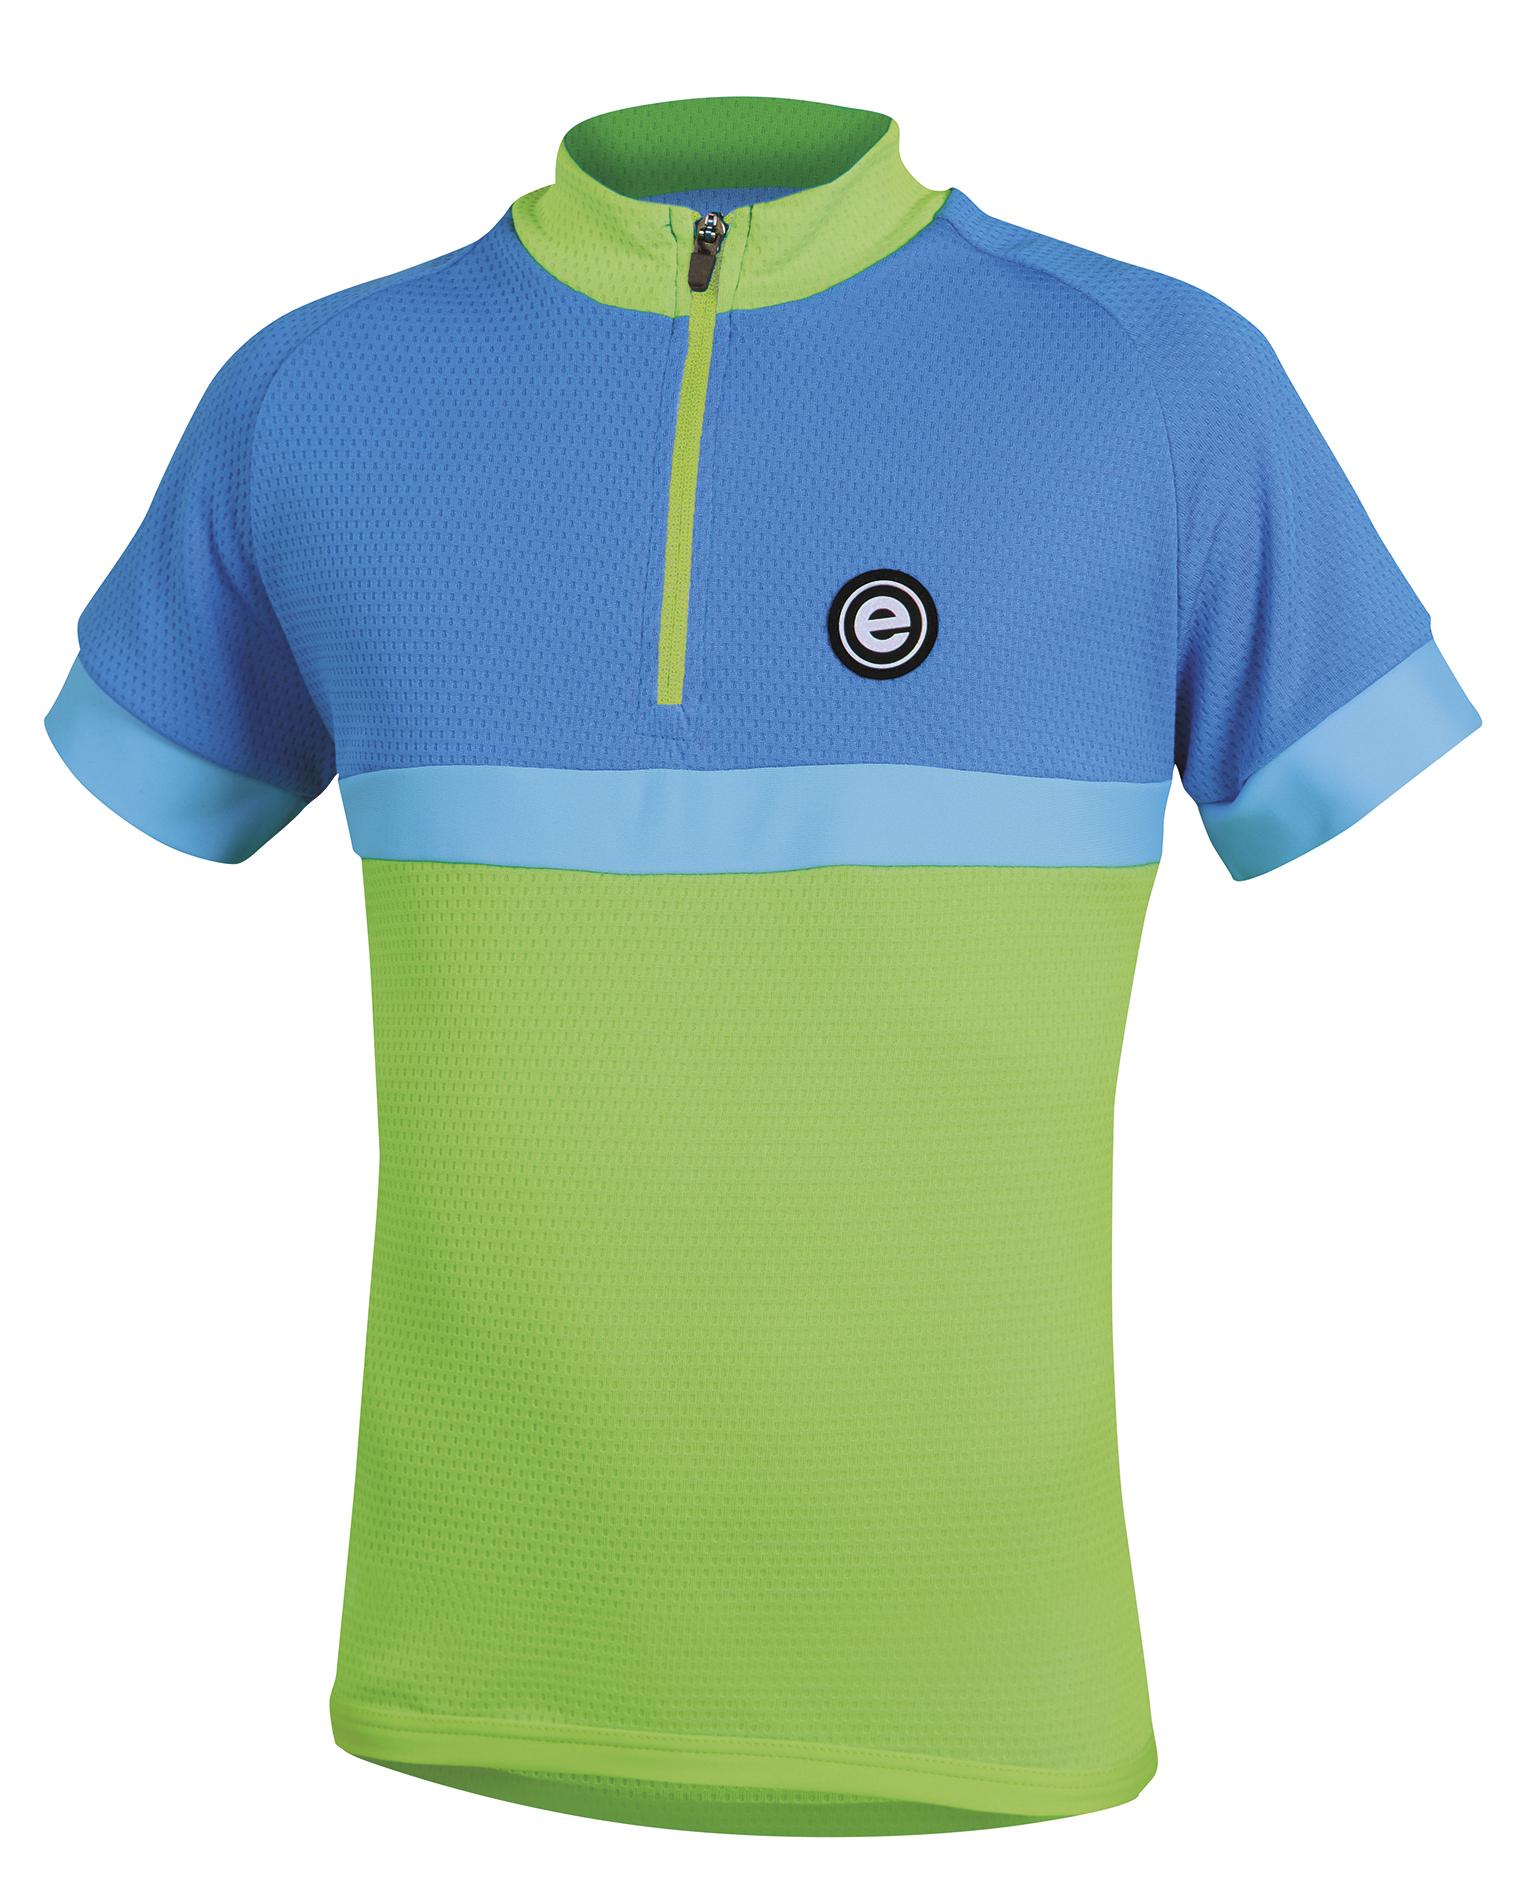 Dětský cyklistický dres ETAPE Bambino, 128/134, zelená/modrá, model 2017 (Dětský dres Etape, přední zip)